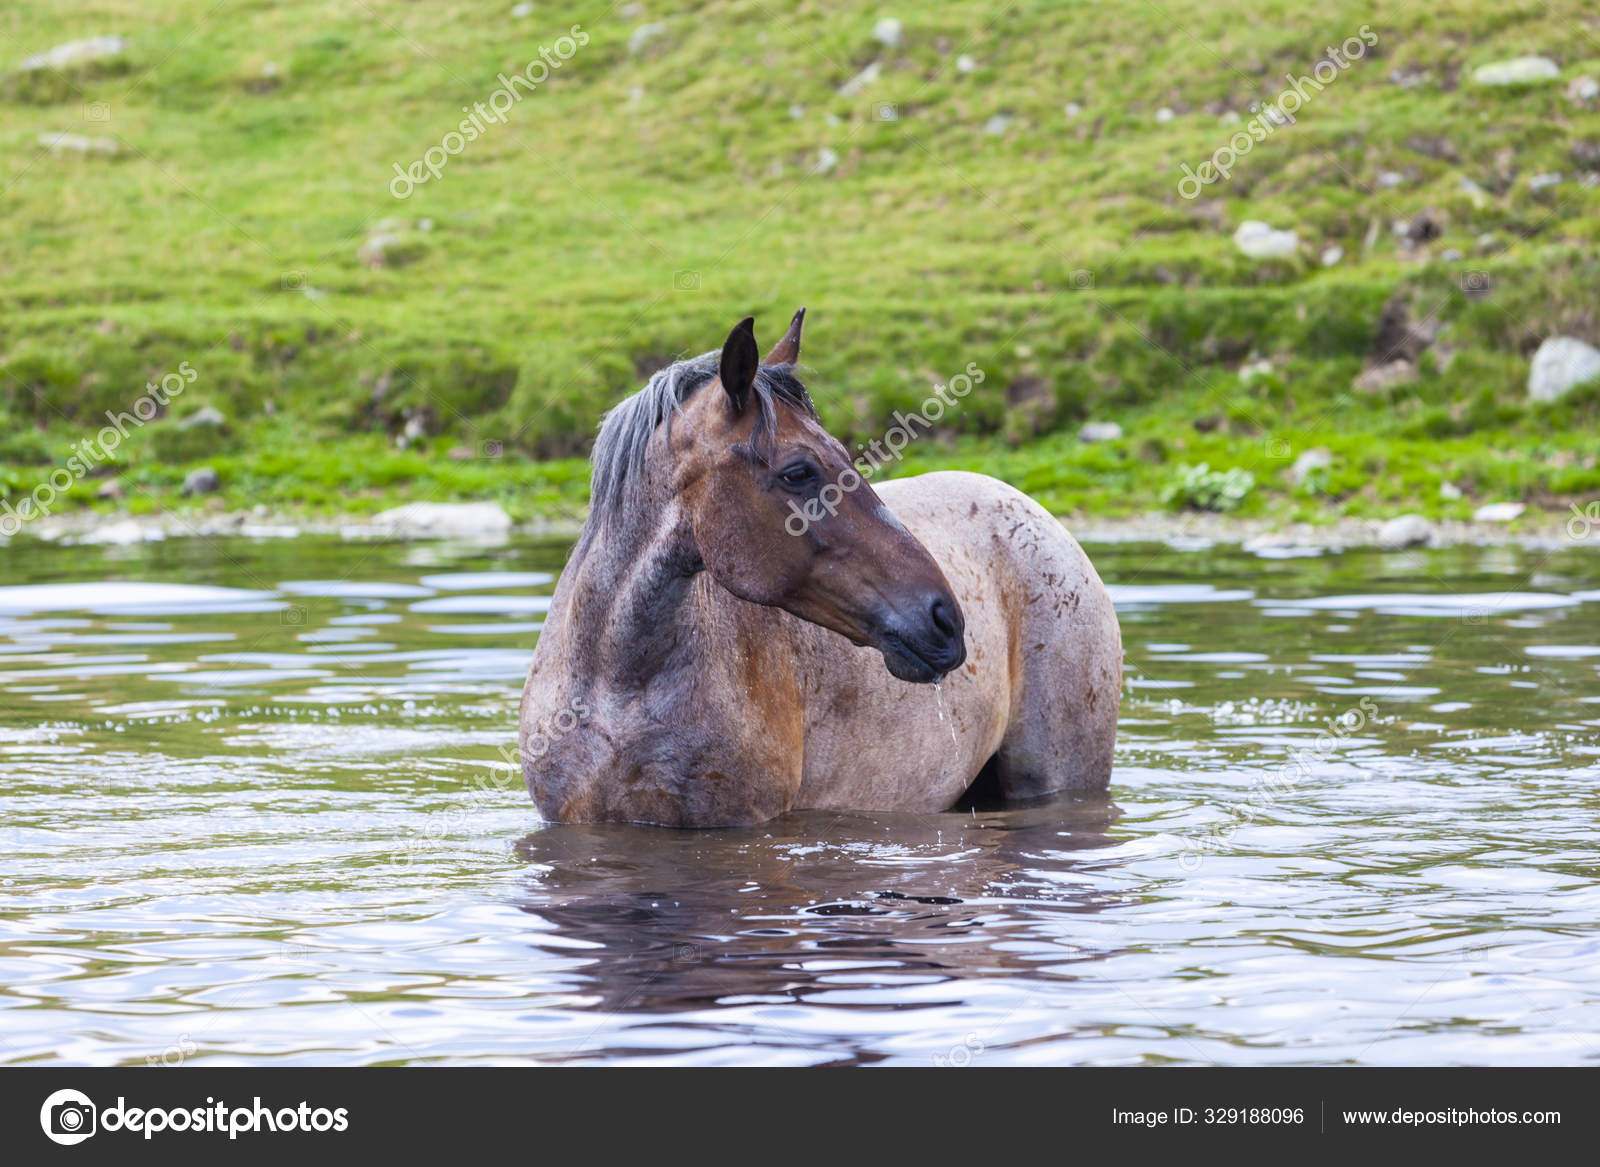 Beautiful Wild Horses Roaming Free Mountains Summer Stock Photo C Cta88 329188096